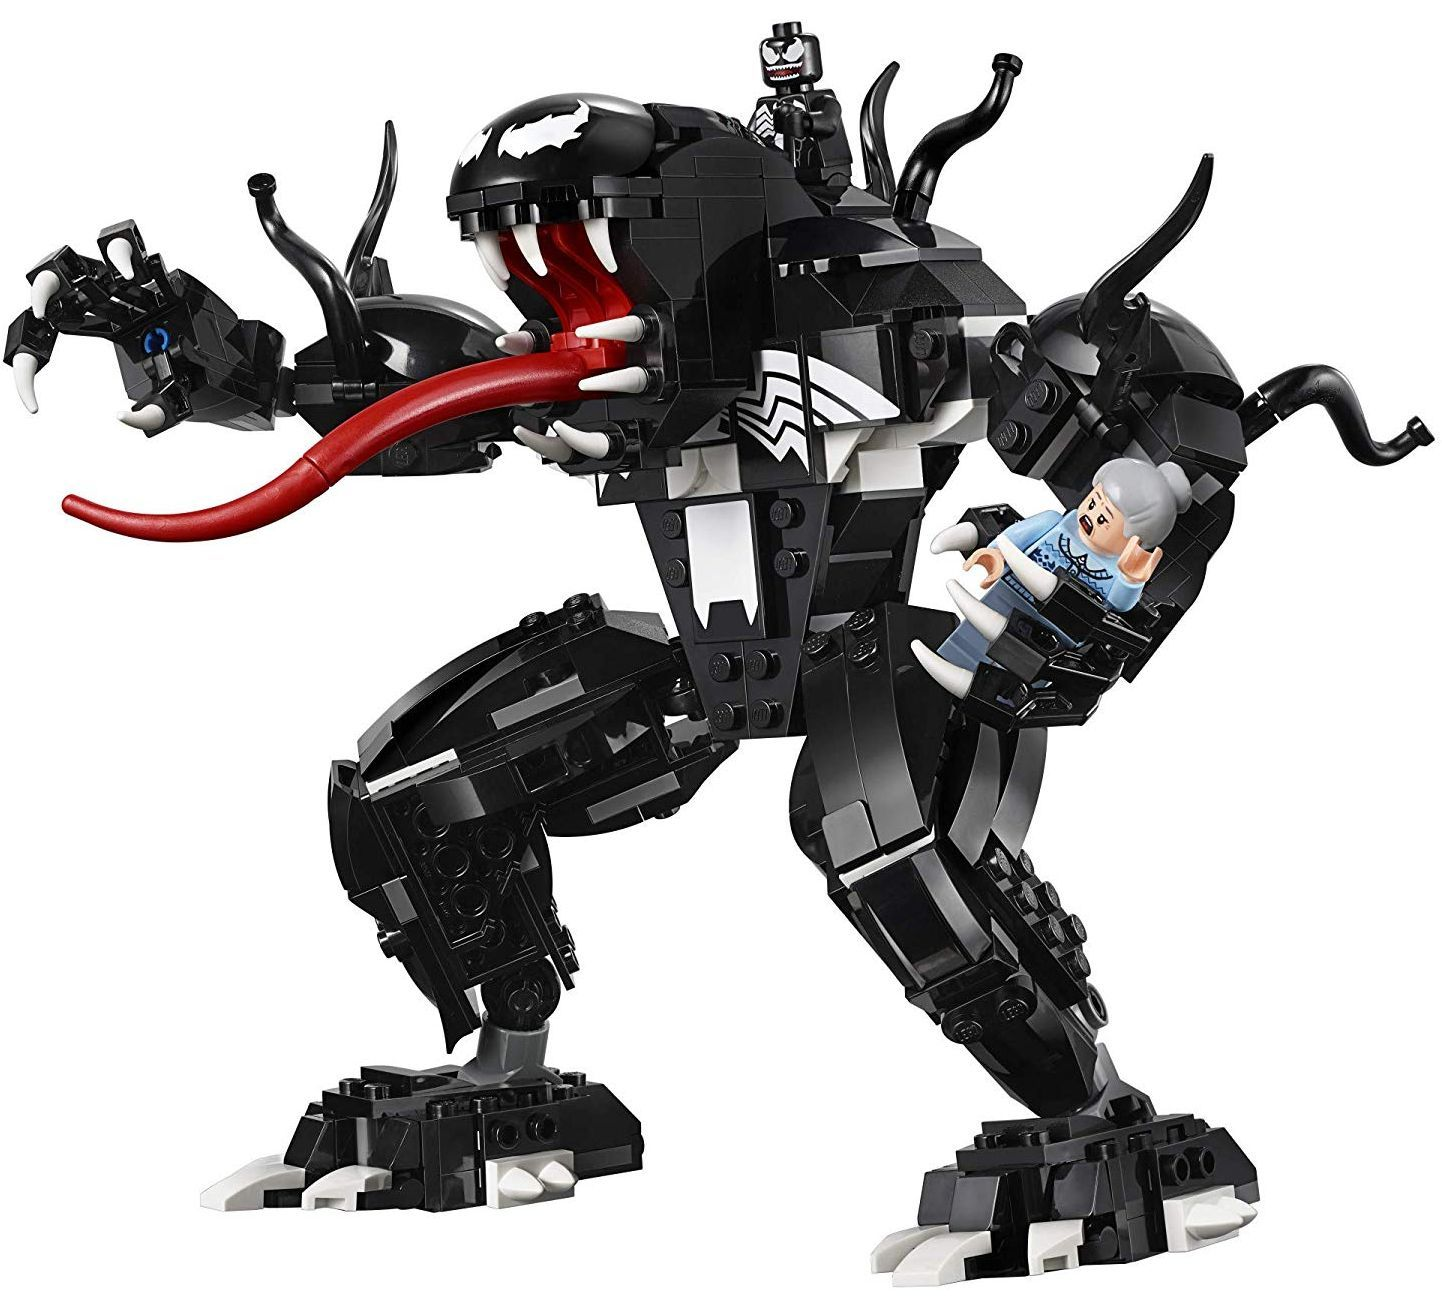 Конструктор Lego Marvel Super Heroes - Spider Mech vs. Venom (76115) - 8